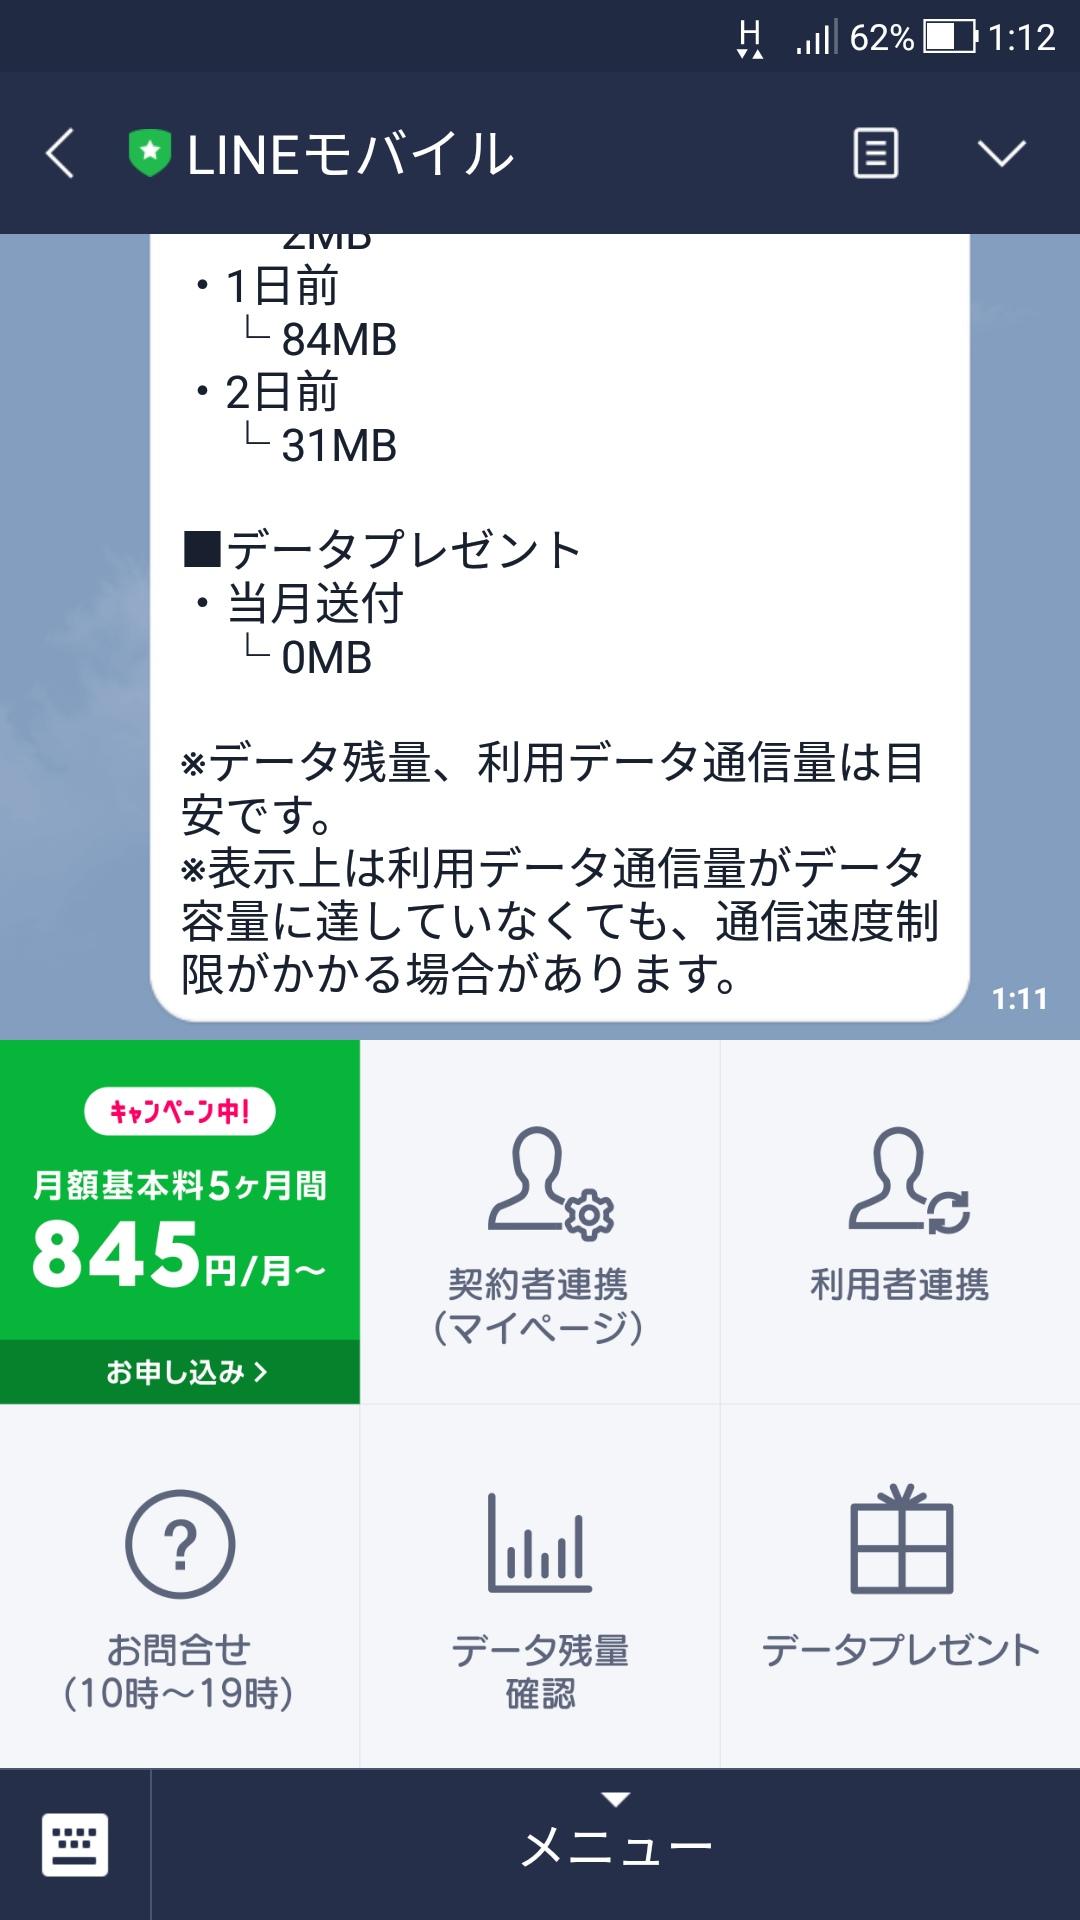 LINmobile_0201_2.jpg